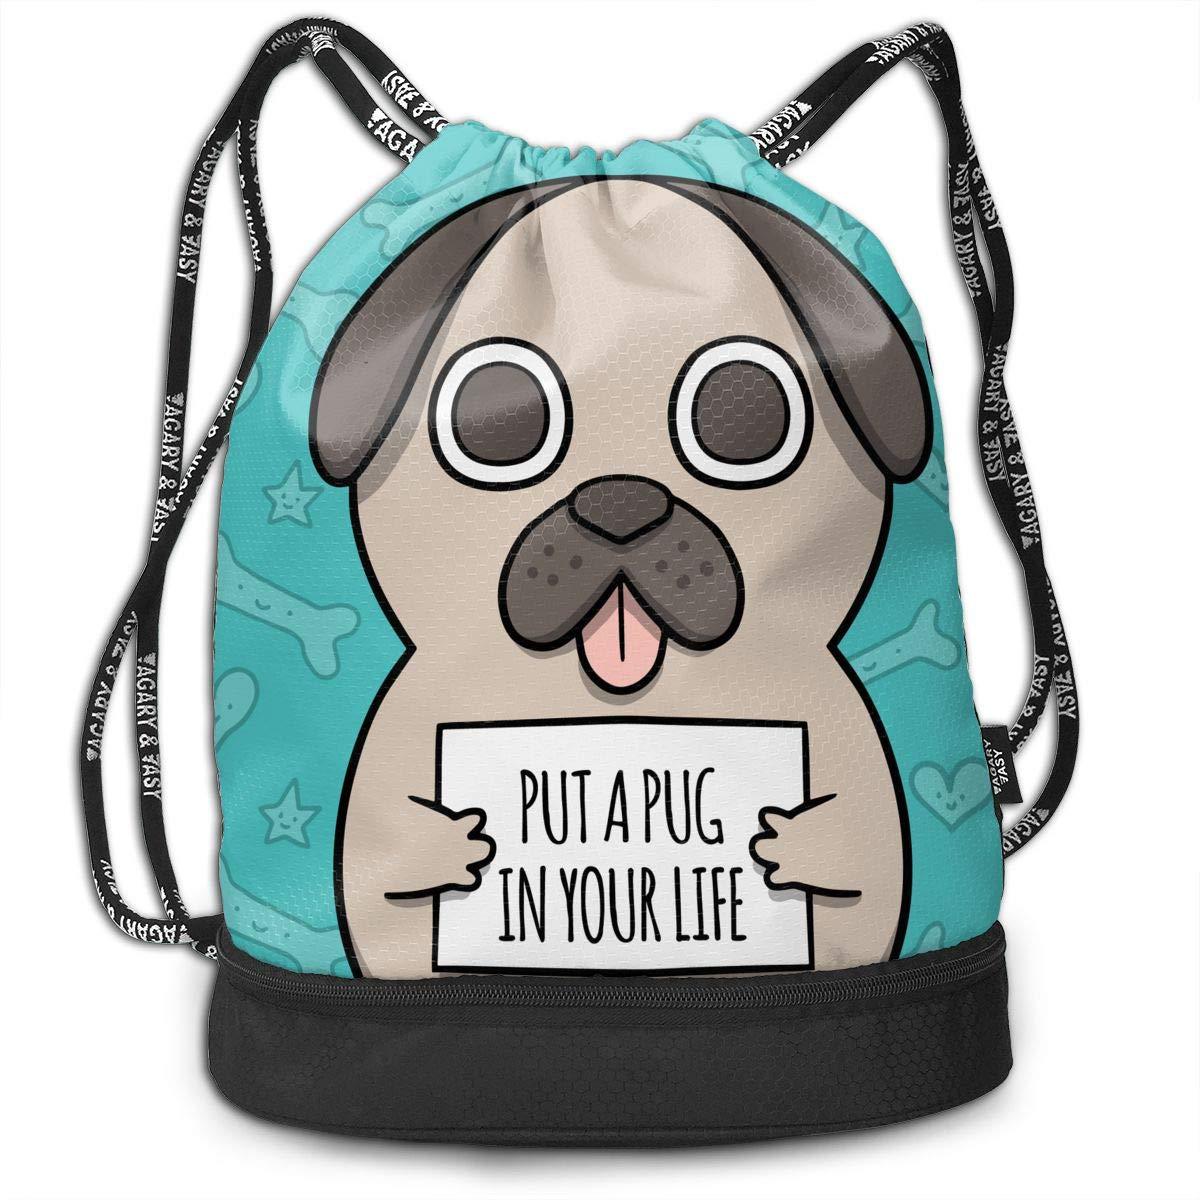 dd09484046ec Amazon.com: HUOPR5Q Dog Drawstring Backpack Sport Gym Sack Shoulder ...